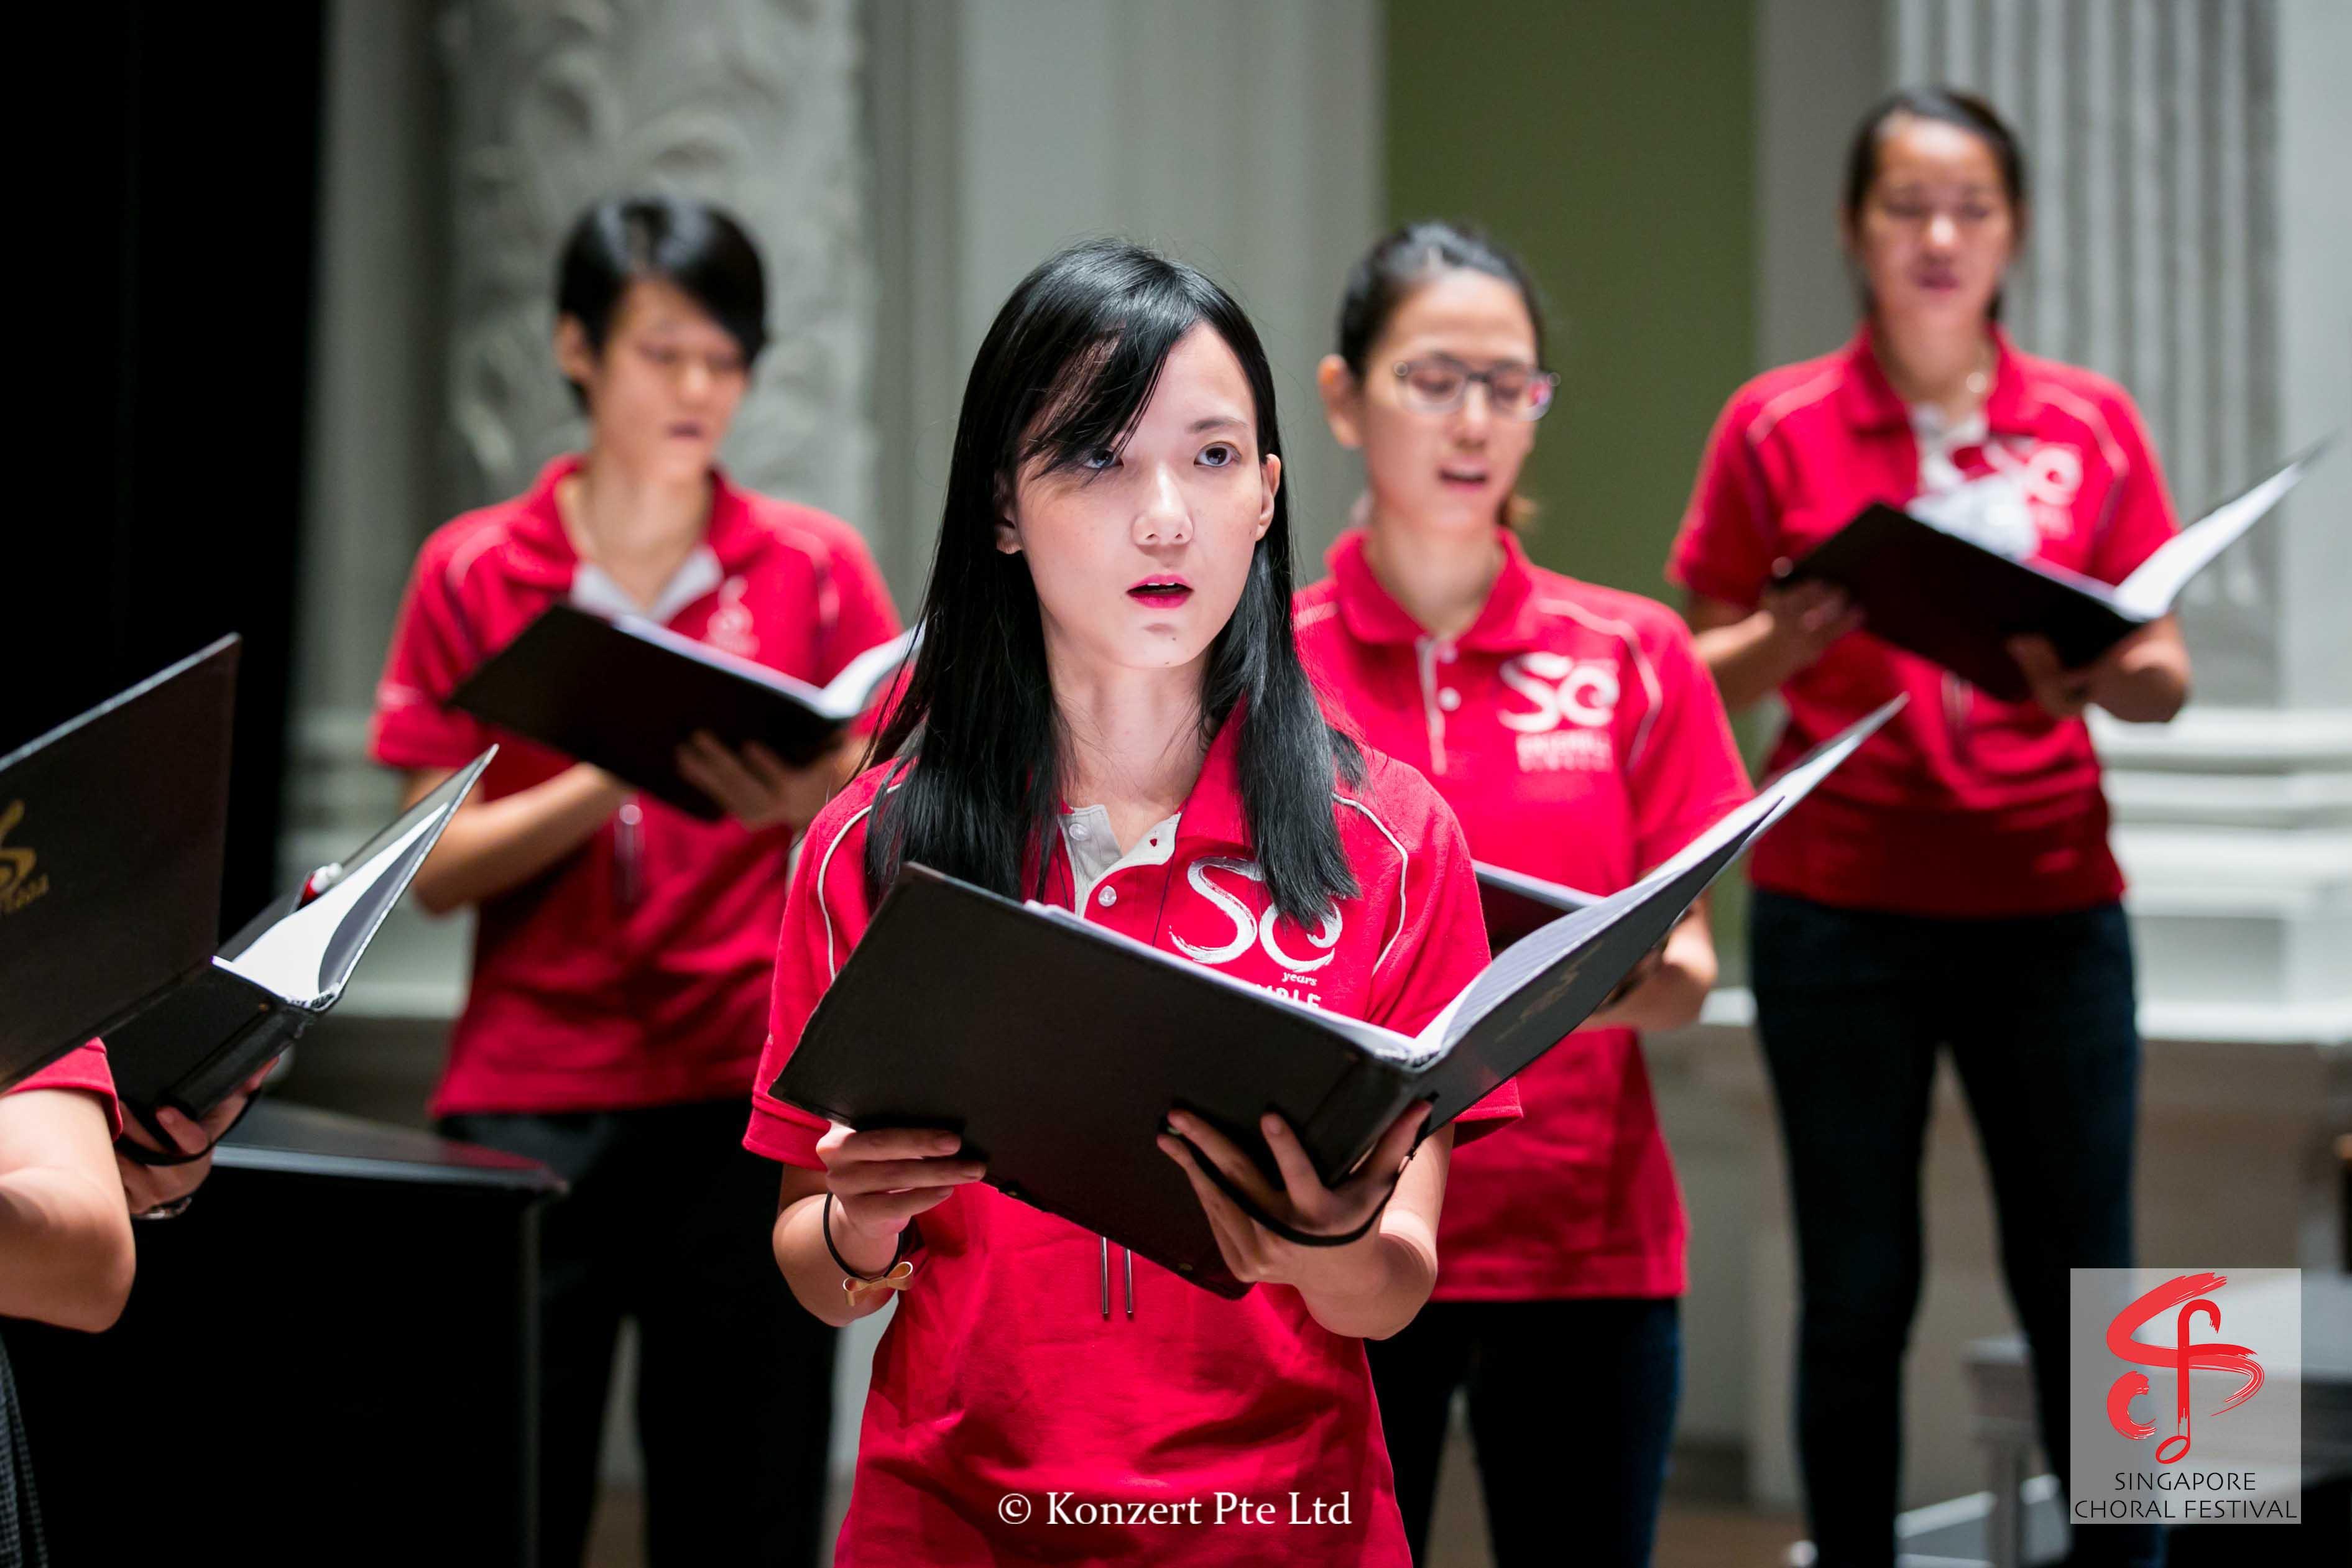 Singapore Choral Festival 8-8-15 (47).jpg